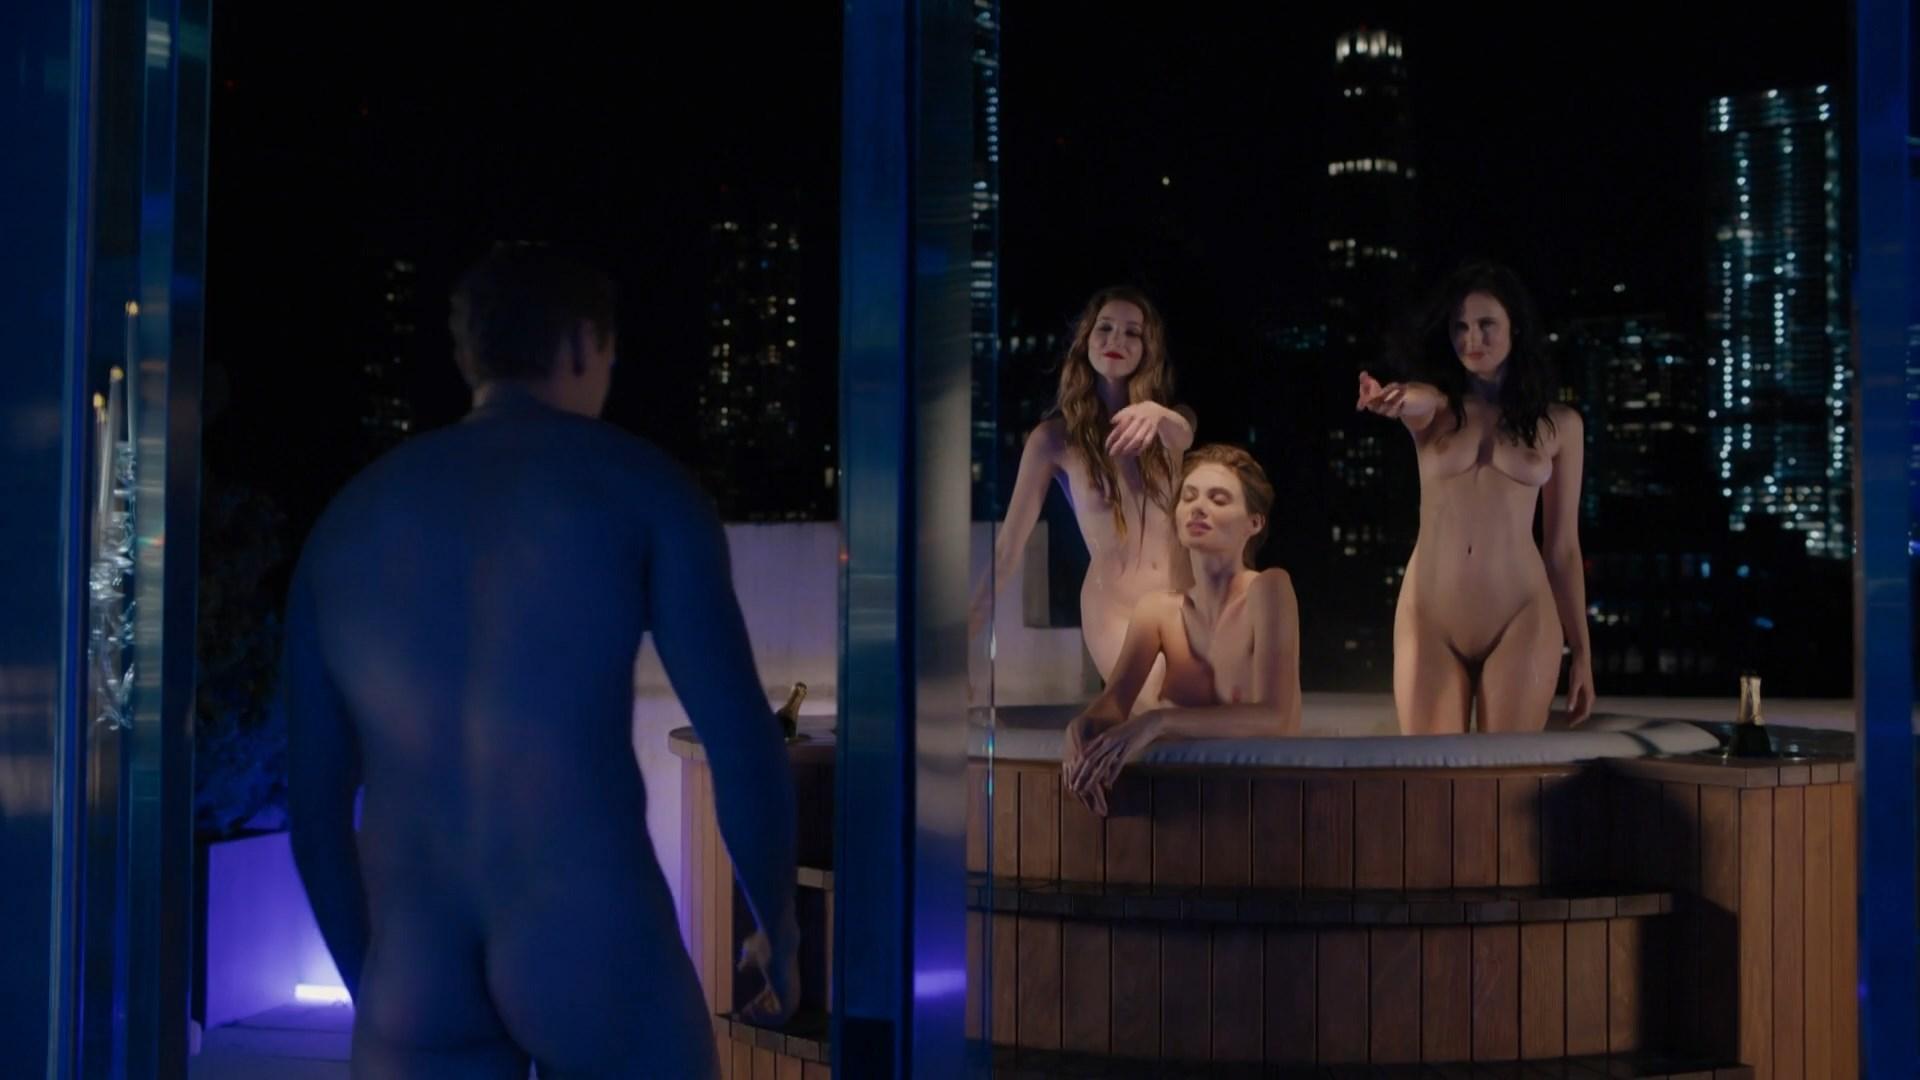 Hanks bar sex orlando